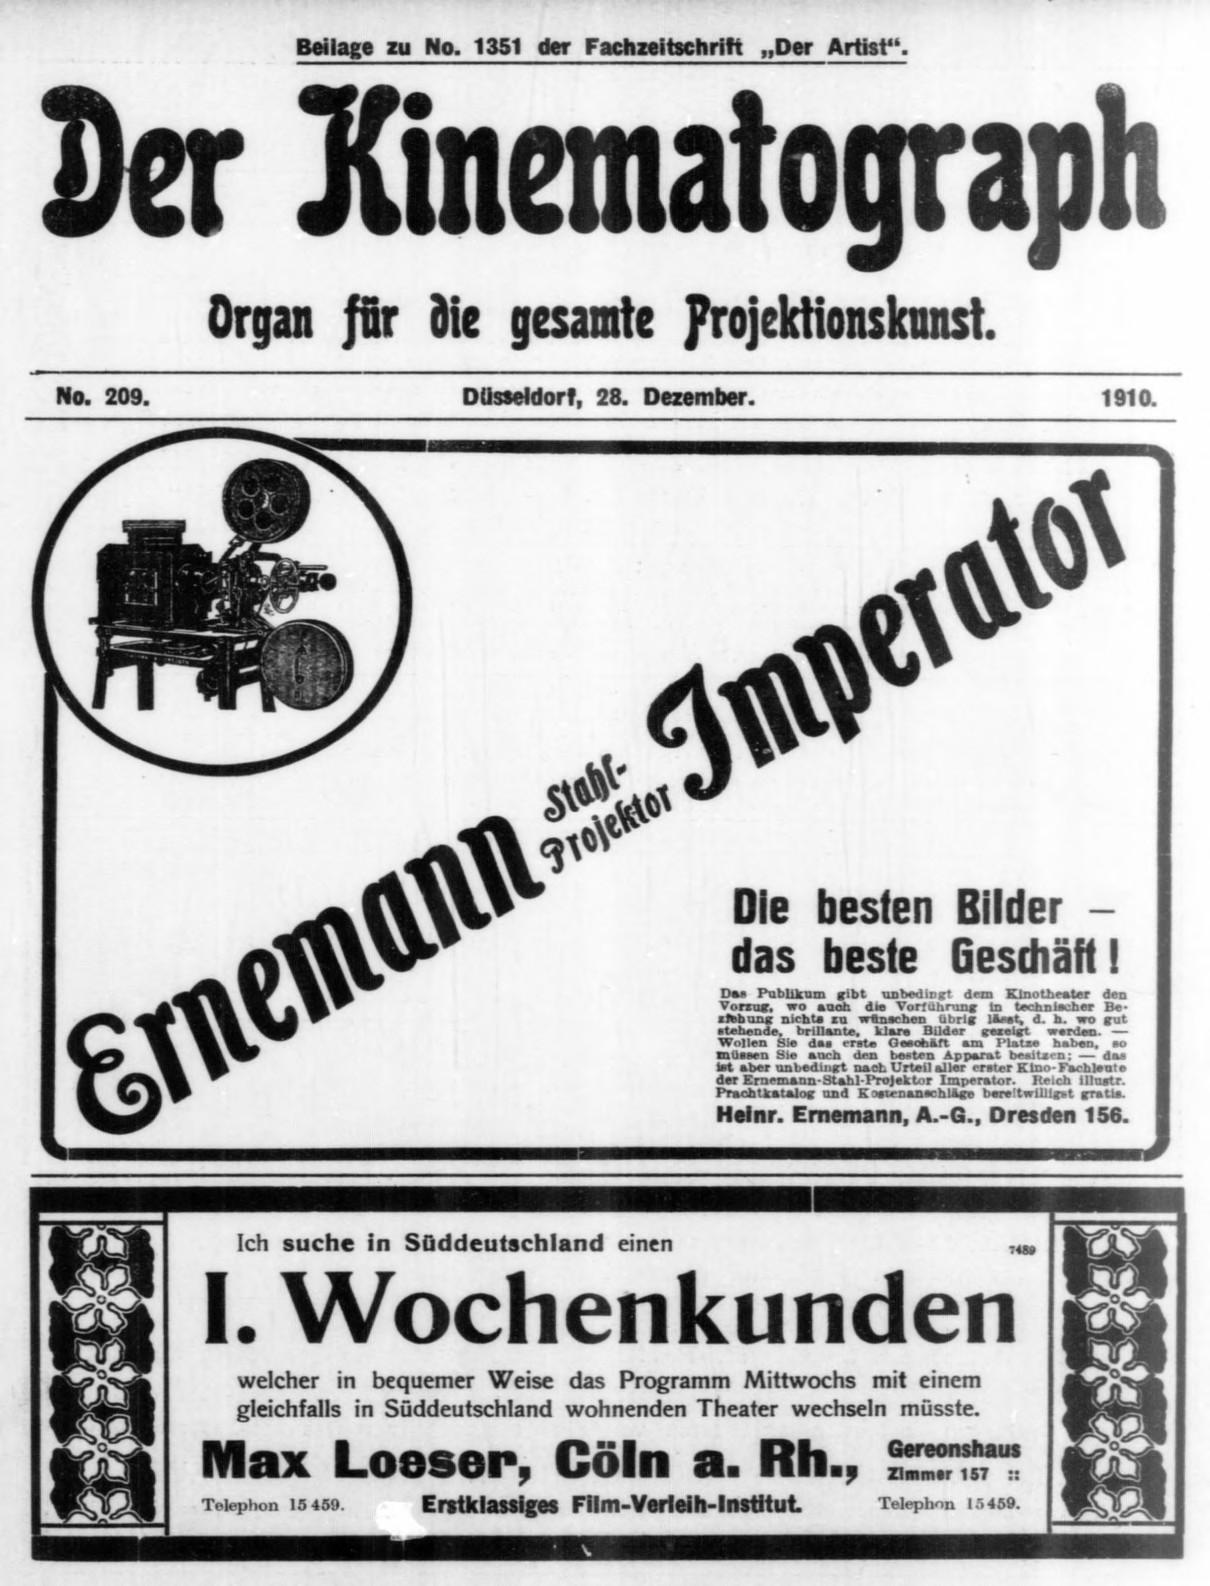 Kinematograph04-1910-12_jp2.zip&file=kinematograph04-1910-12_jp2%2fkinematograph04-1910-12_0086